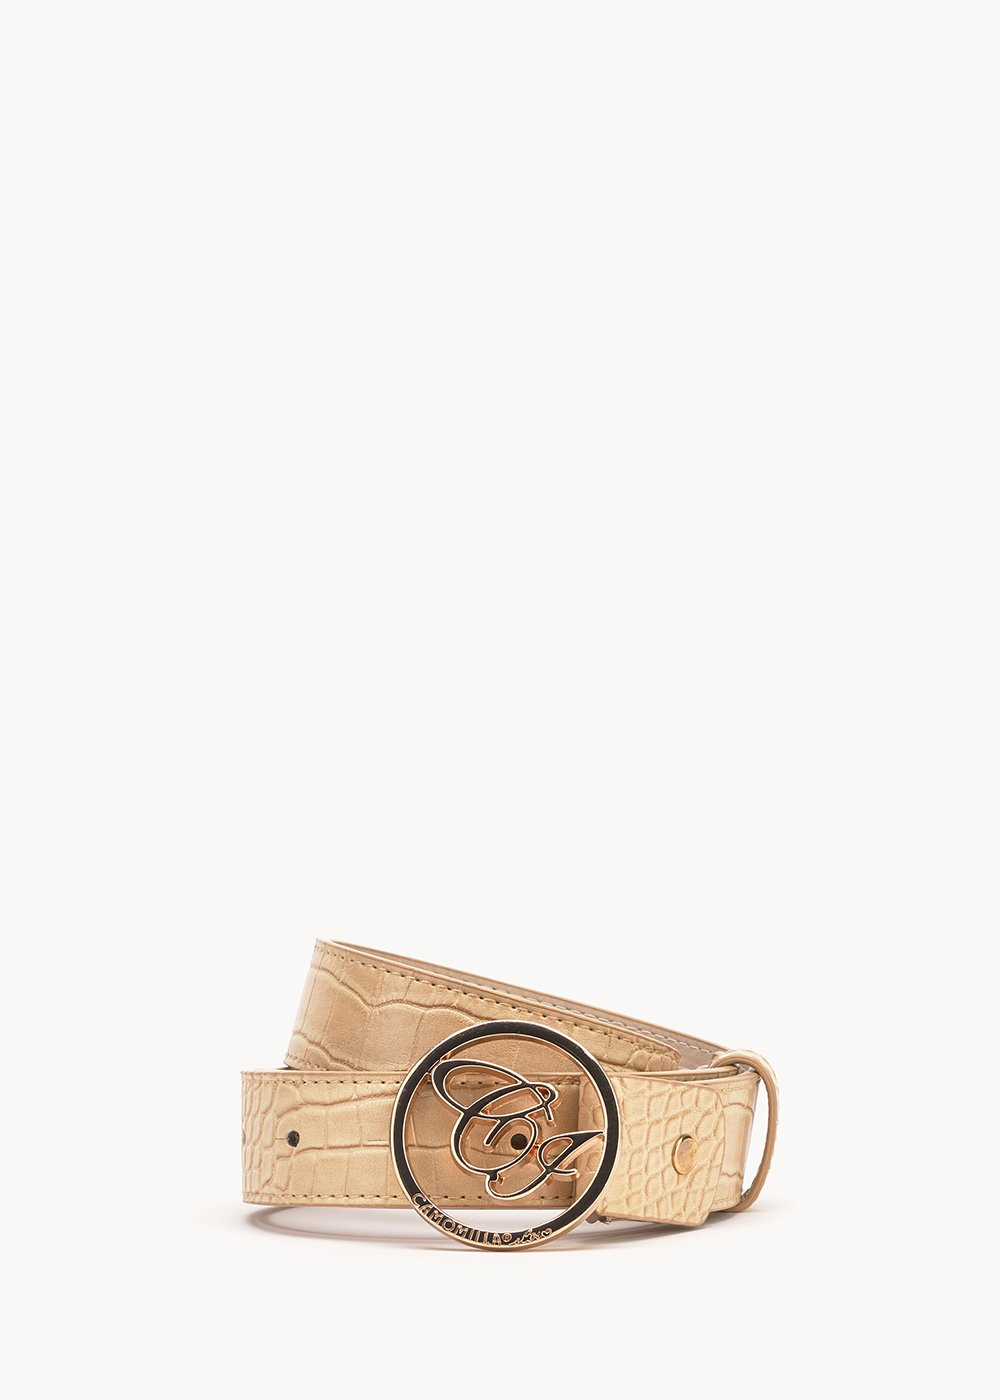 Codys belt with CI logo - Safari - Woman